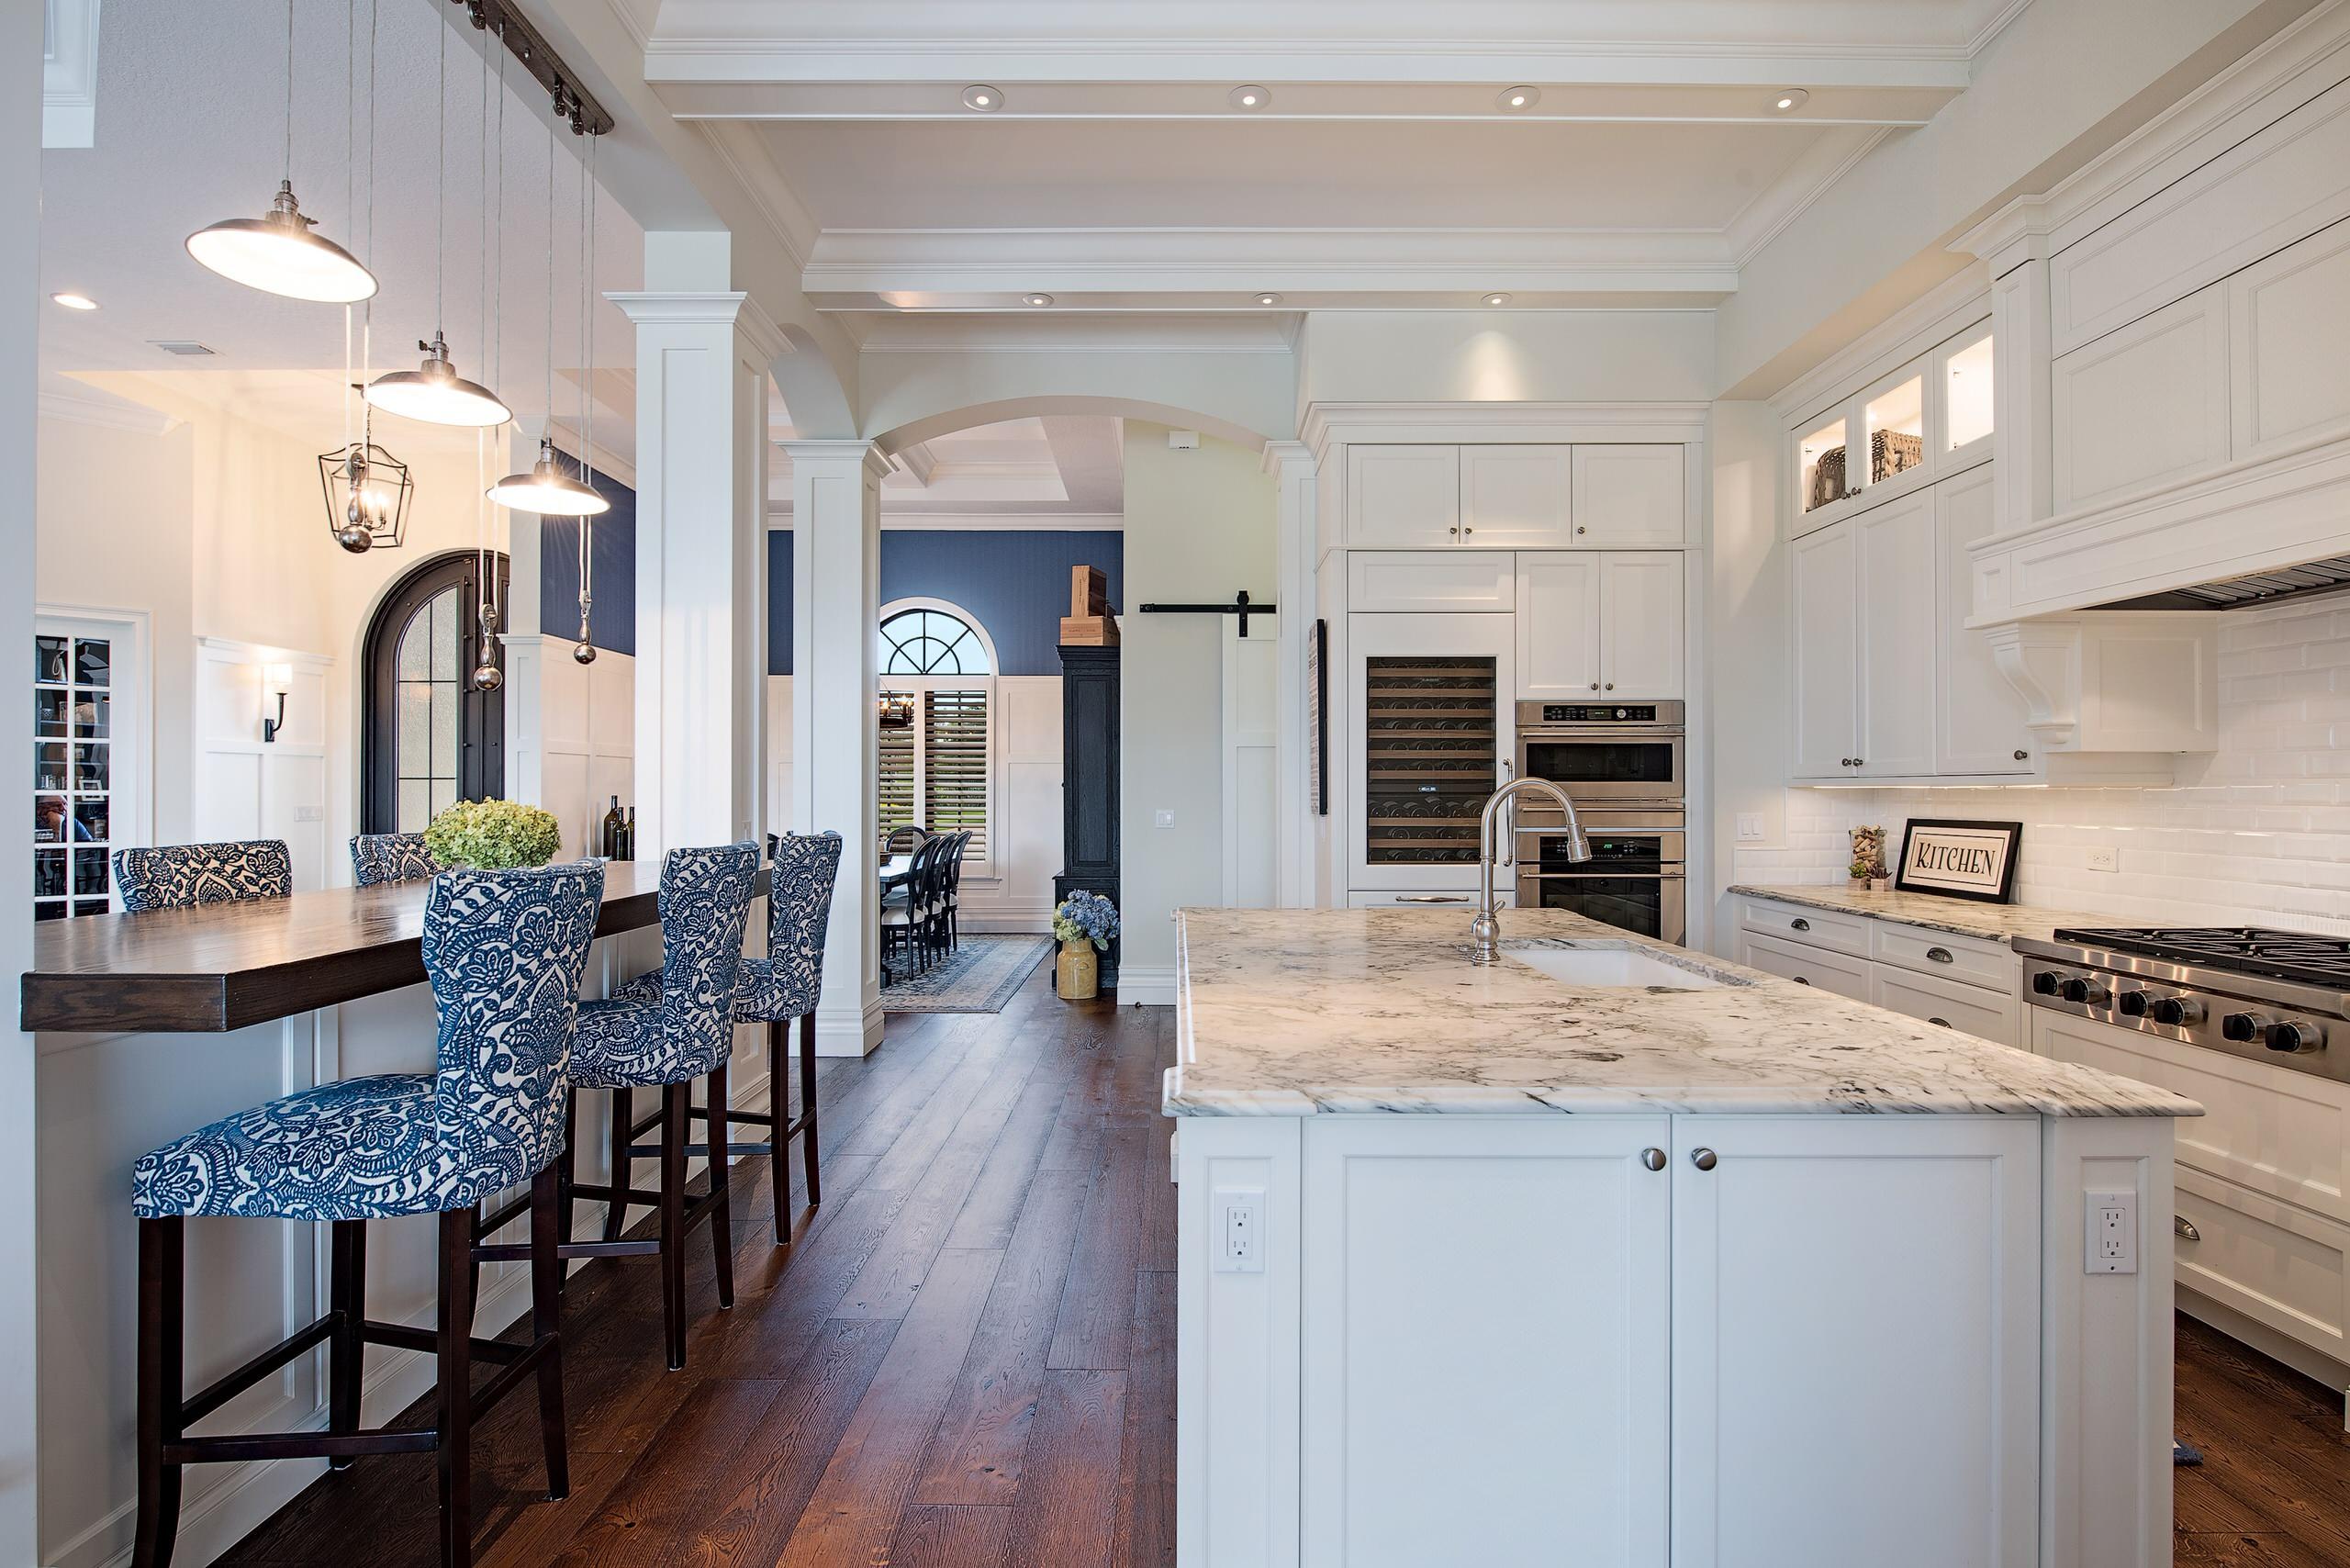 Certified Luxury Builders-41 West-Naples,FL-Quail Remodel 1A